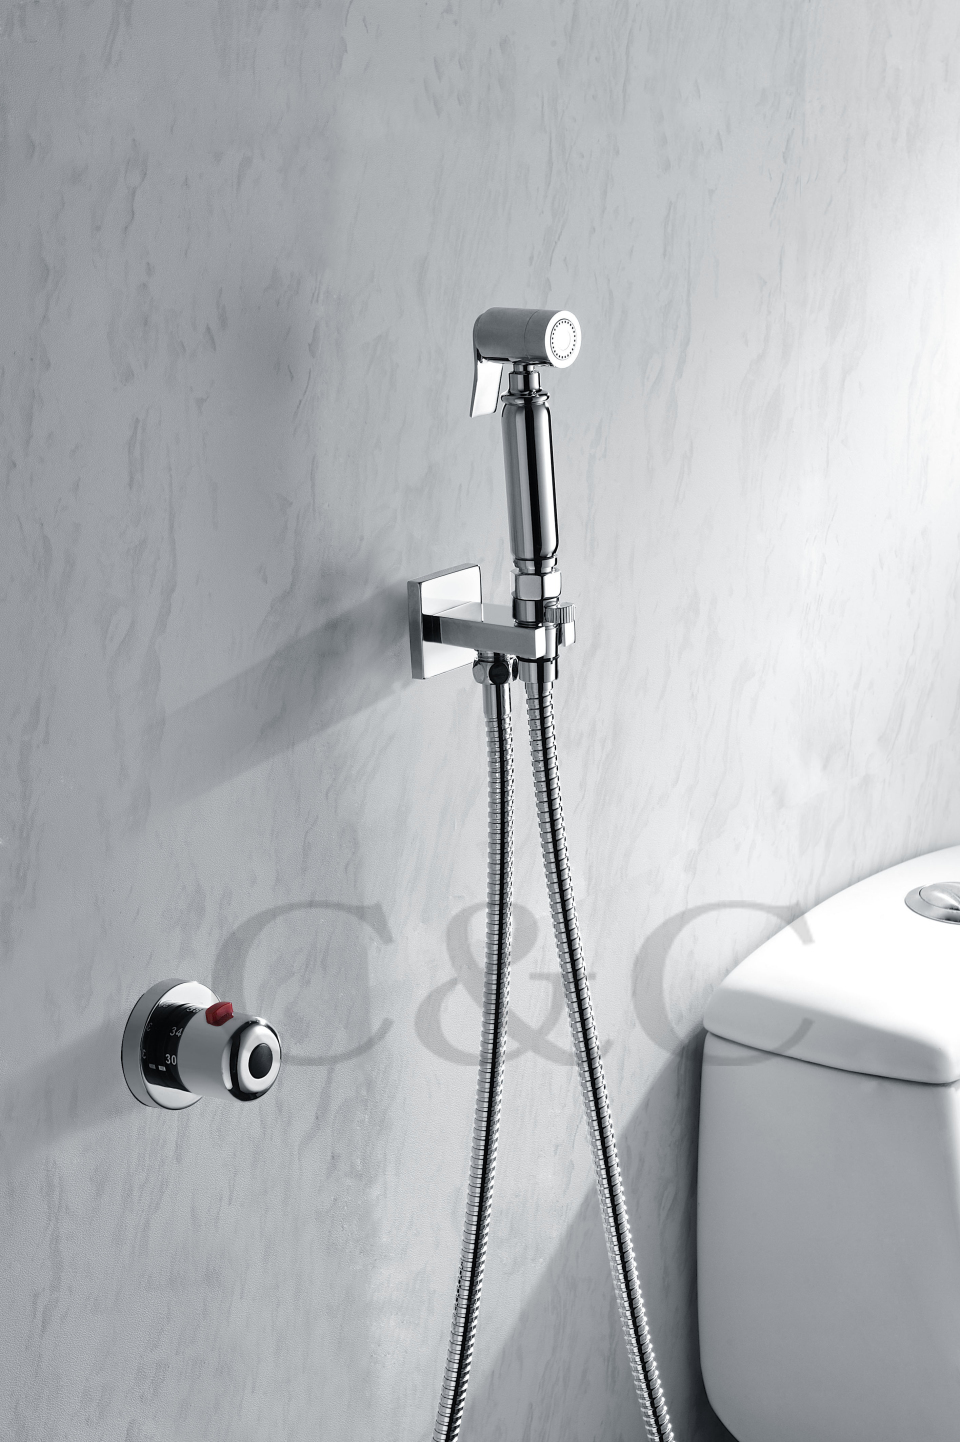 Wall Mounted Handheld Shattaf Bidet Toilet Spray Shower